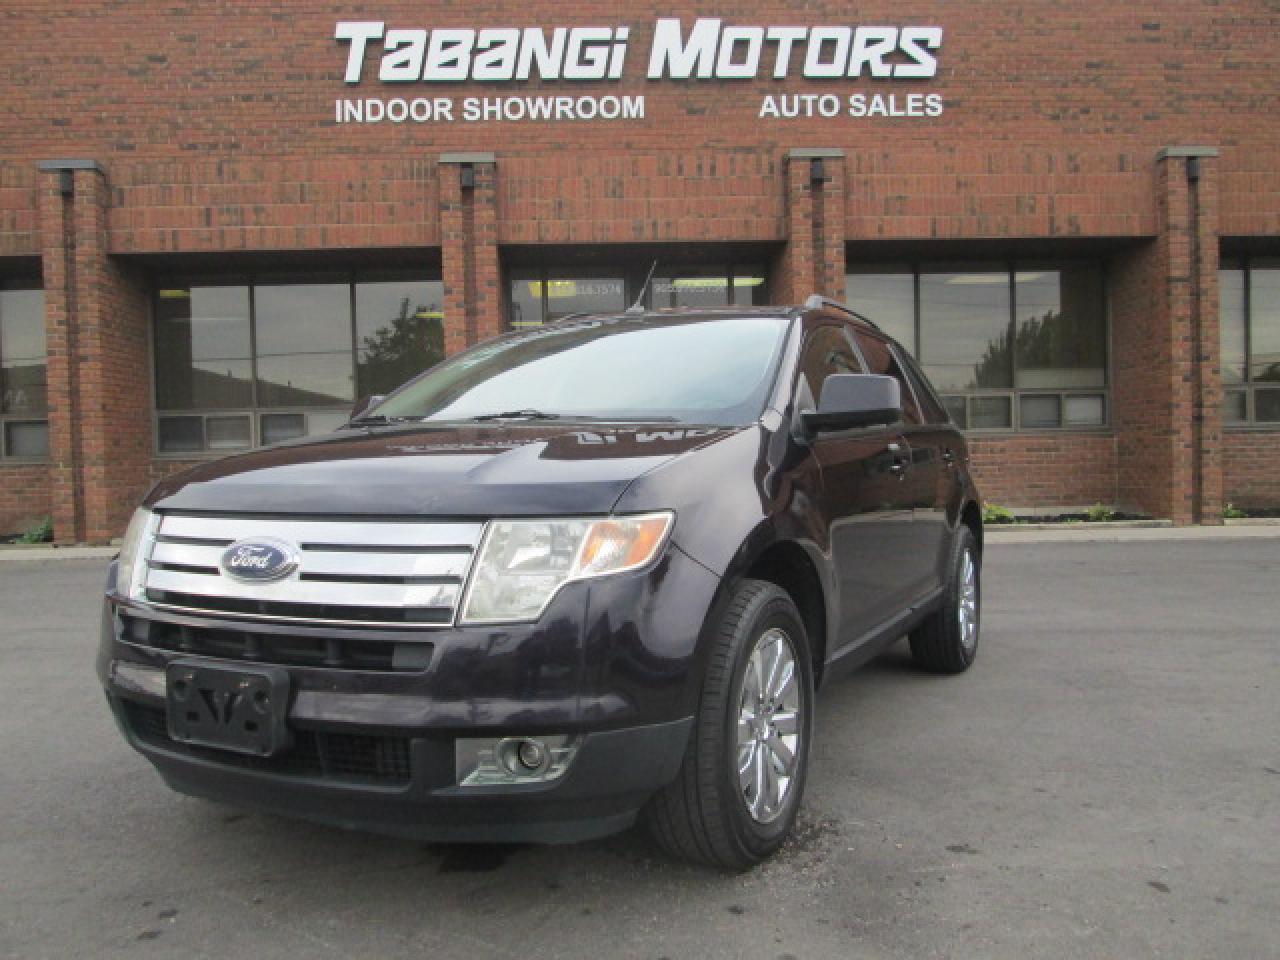 Photo of Black 2007 Ford Edge